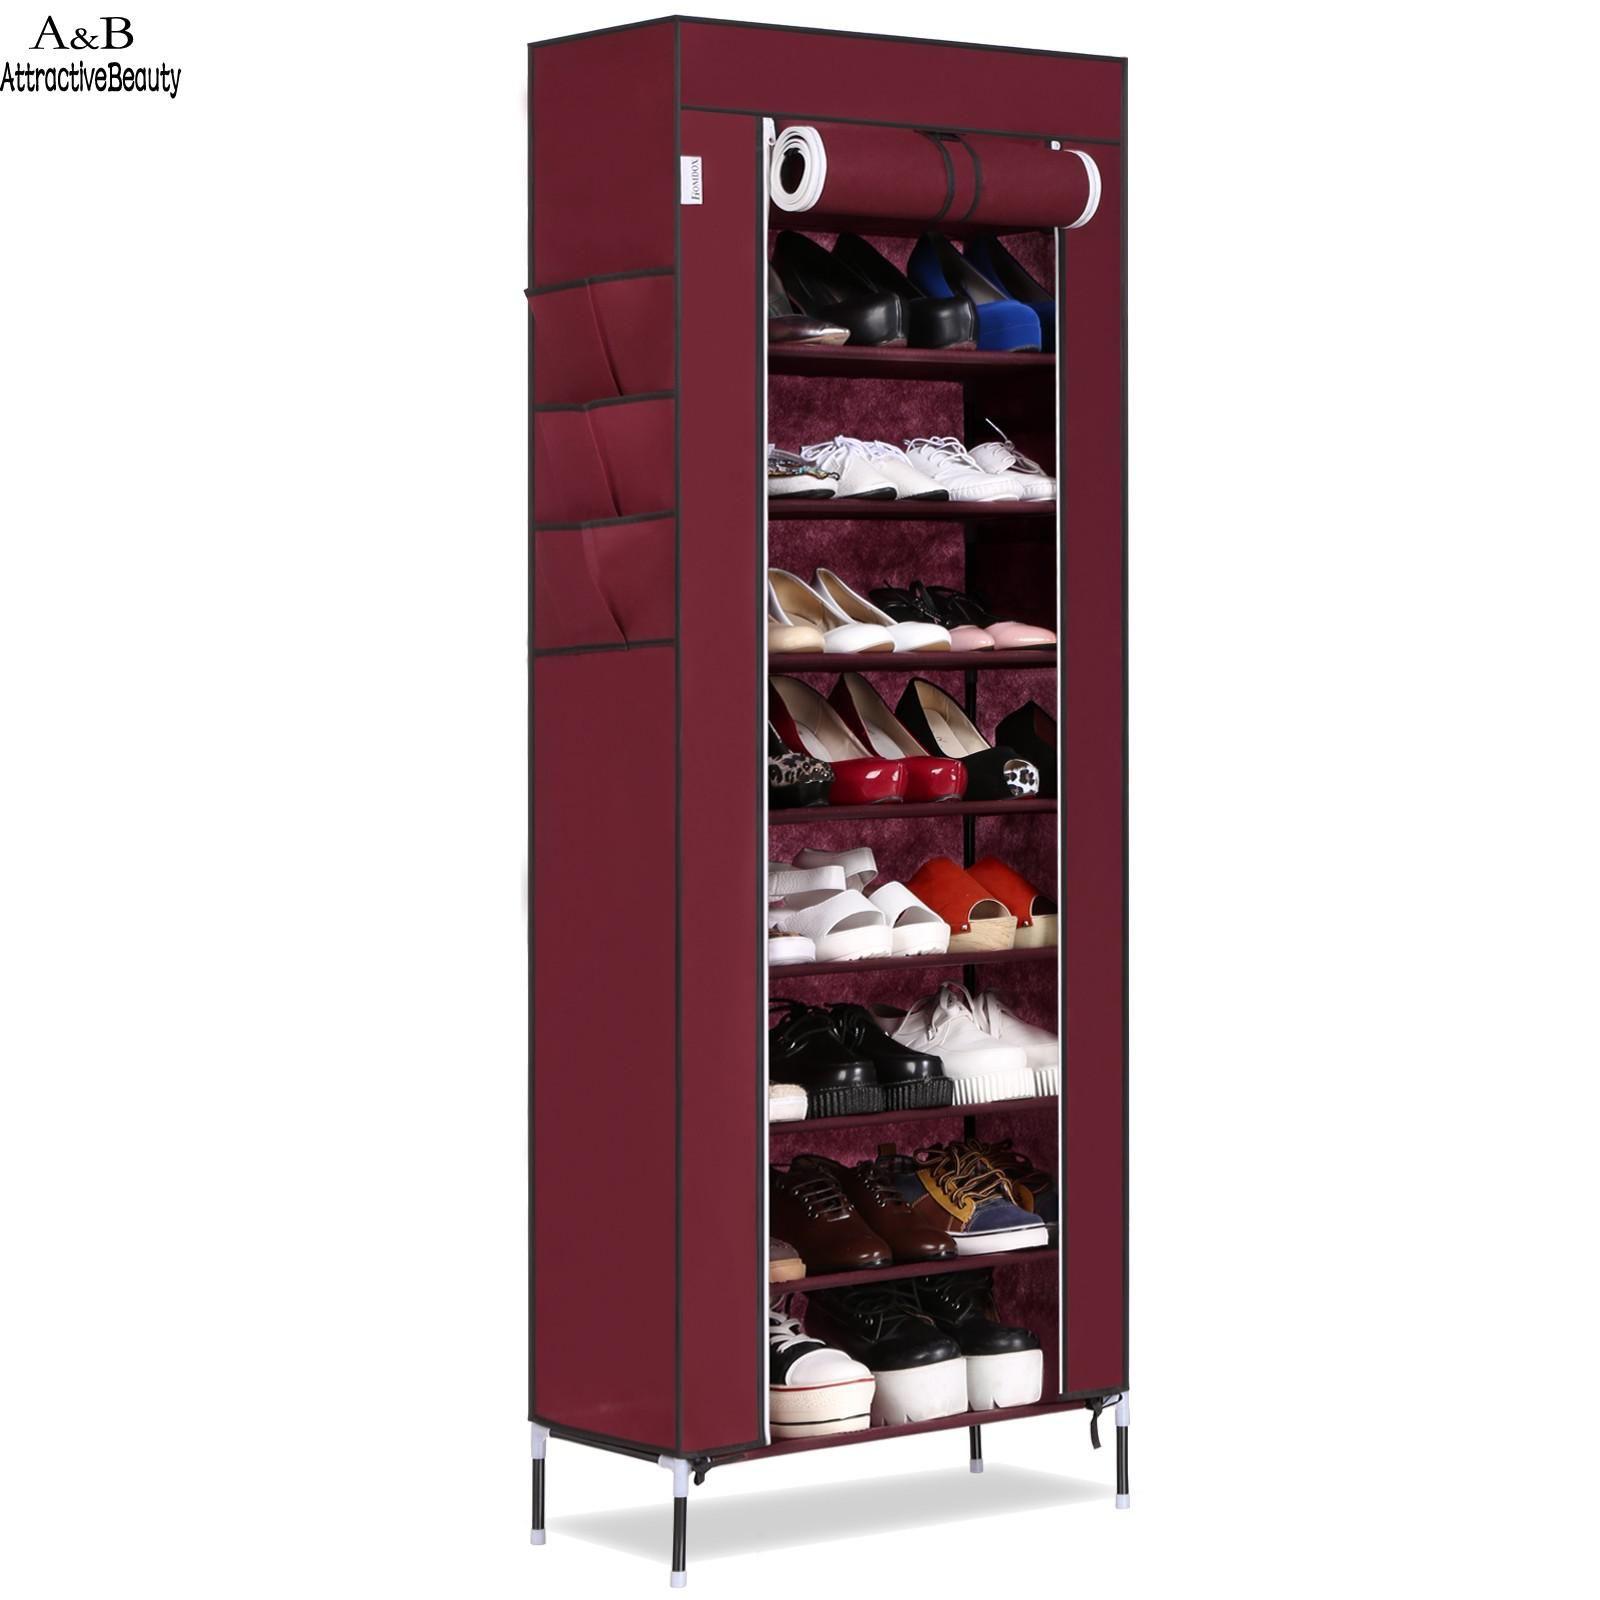 Homdox Shoe Cabinet Shoes Racks Storage Large Capacity Home Furniture Diy Simple Us 23 73 Shoe Rack Shoe Storage Cabinet Shoe Rack With Shelf